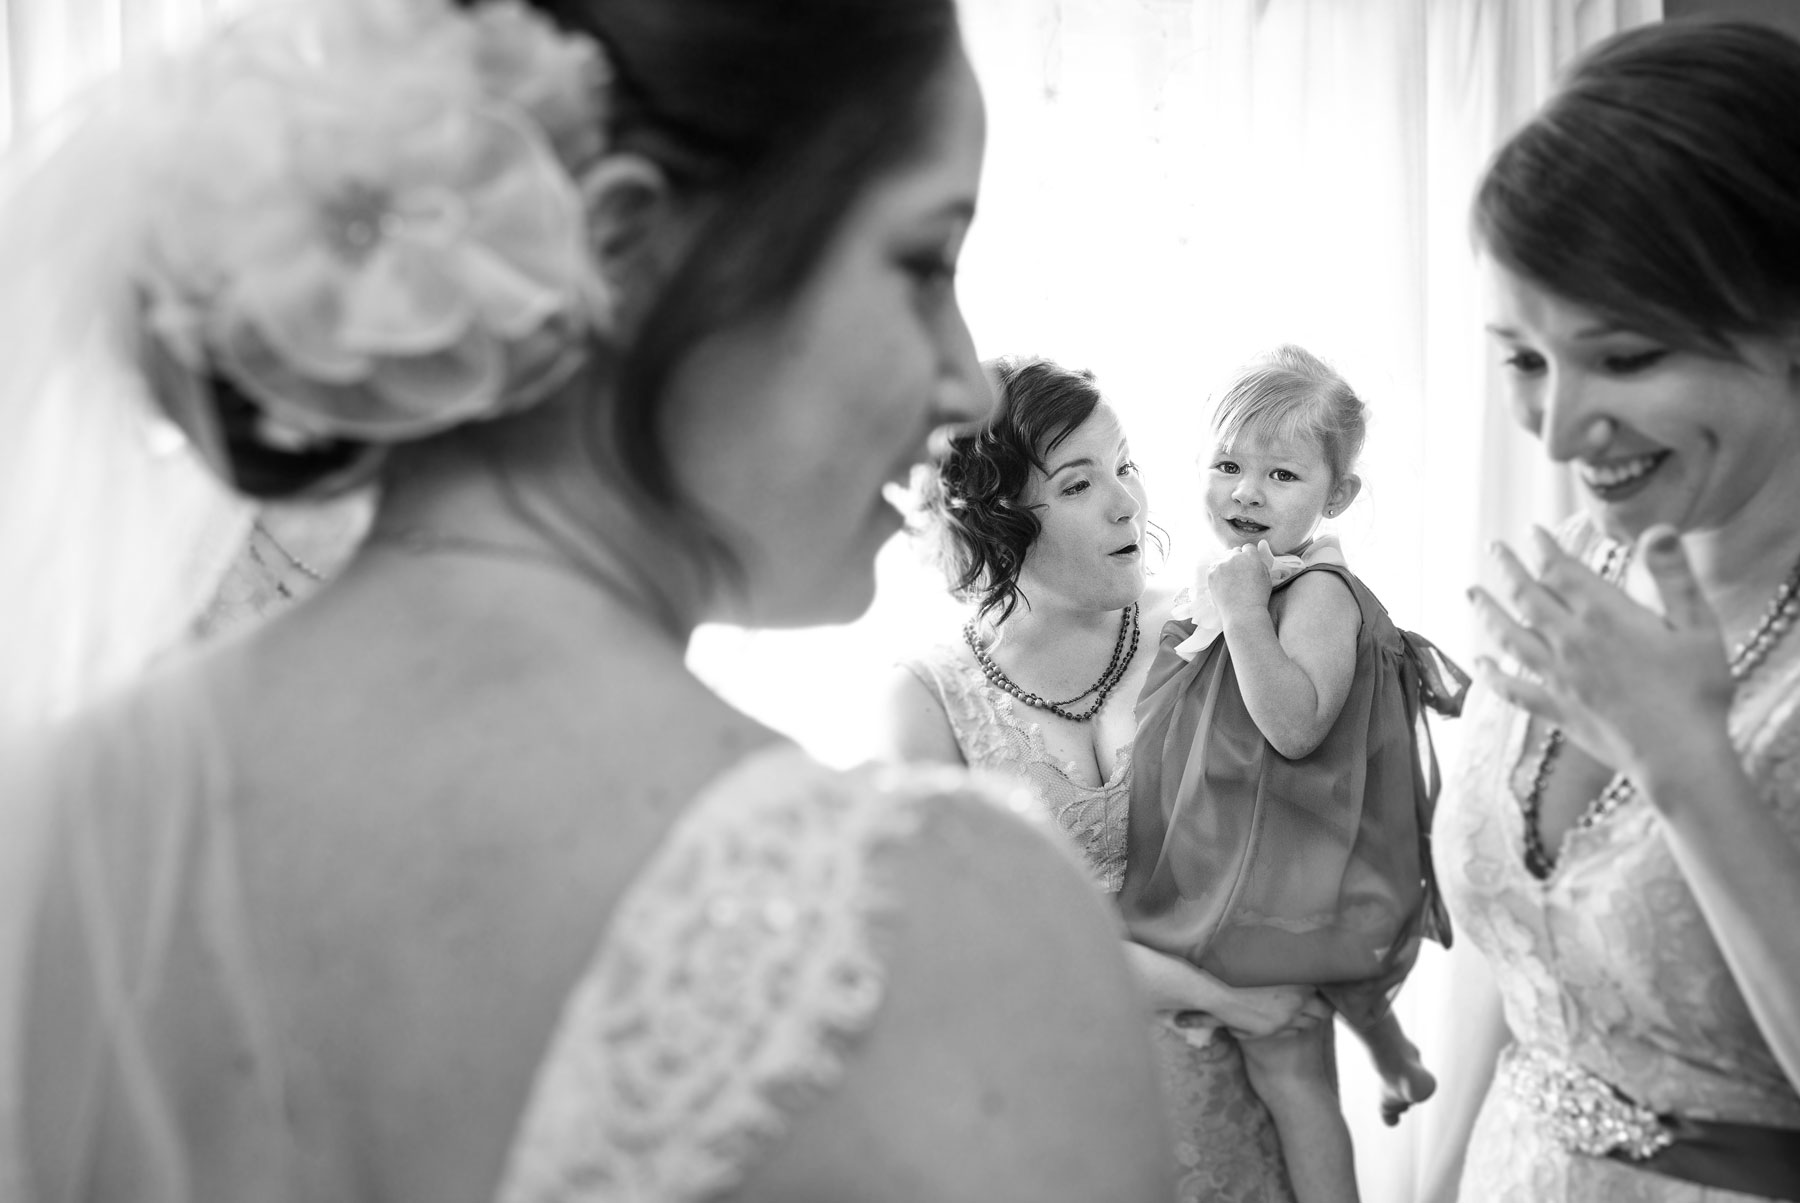 Angela & Patrick - Lacombe, Alberta Wedding Photography - Olson Studios (7)